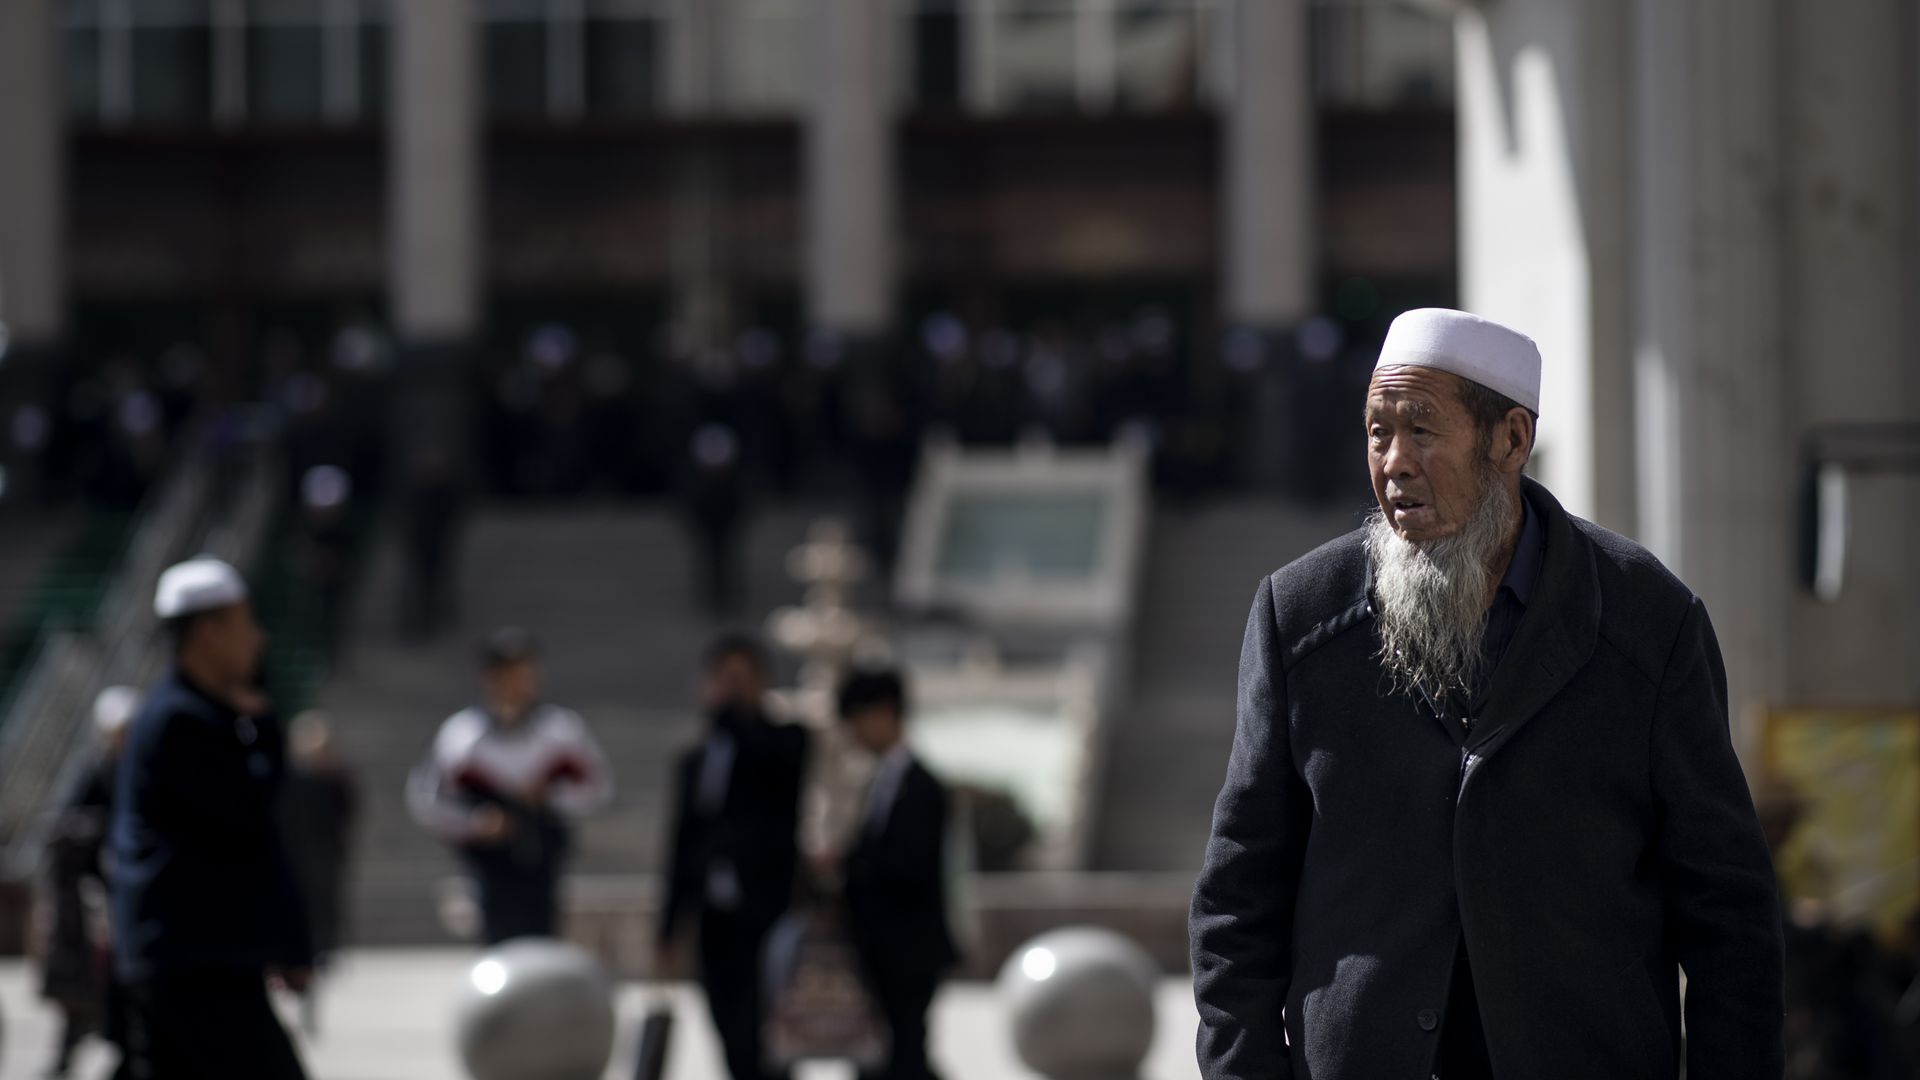 Ethnic Hui Muslim man standing in front of Laohuasi Mosque